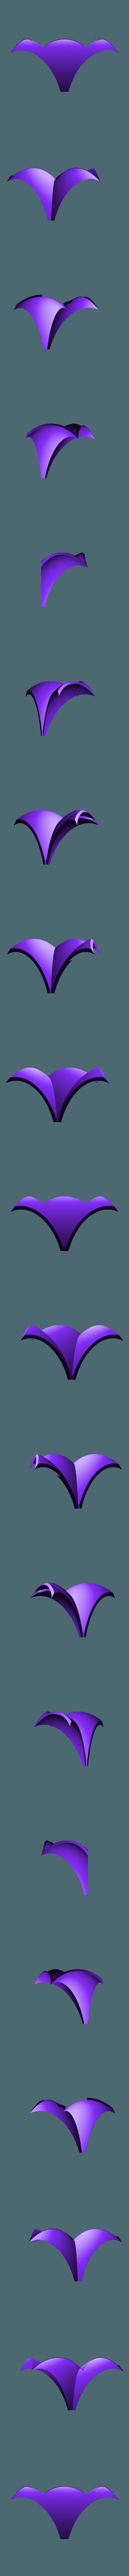 roof_part.stl Download free STL file Little Bird Feeder Air Temple • 3D printer model, Job